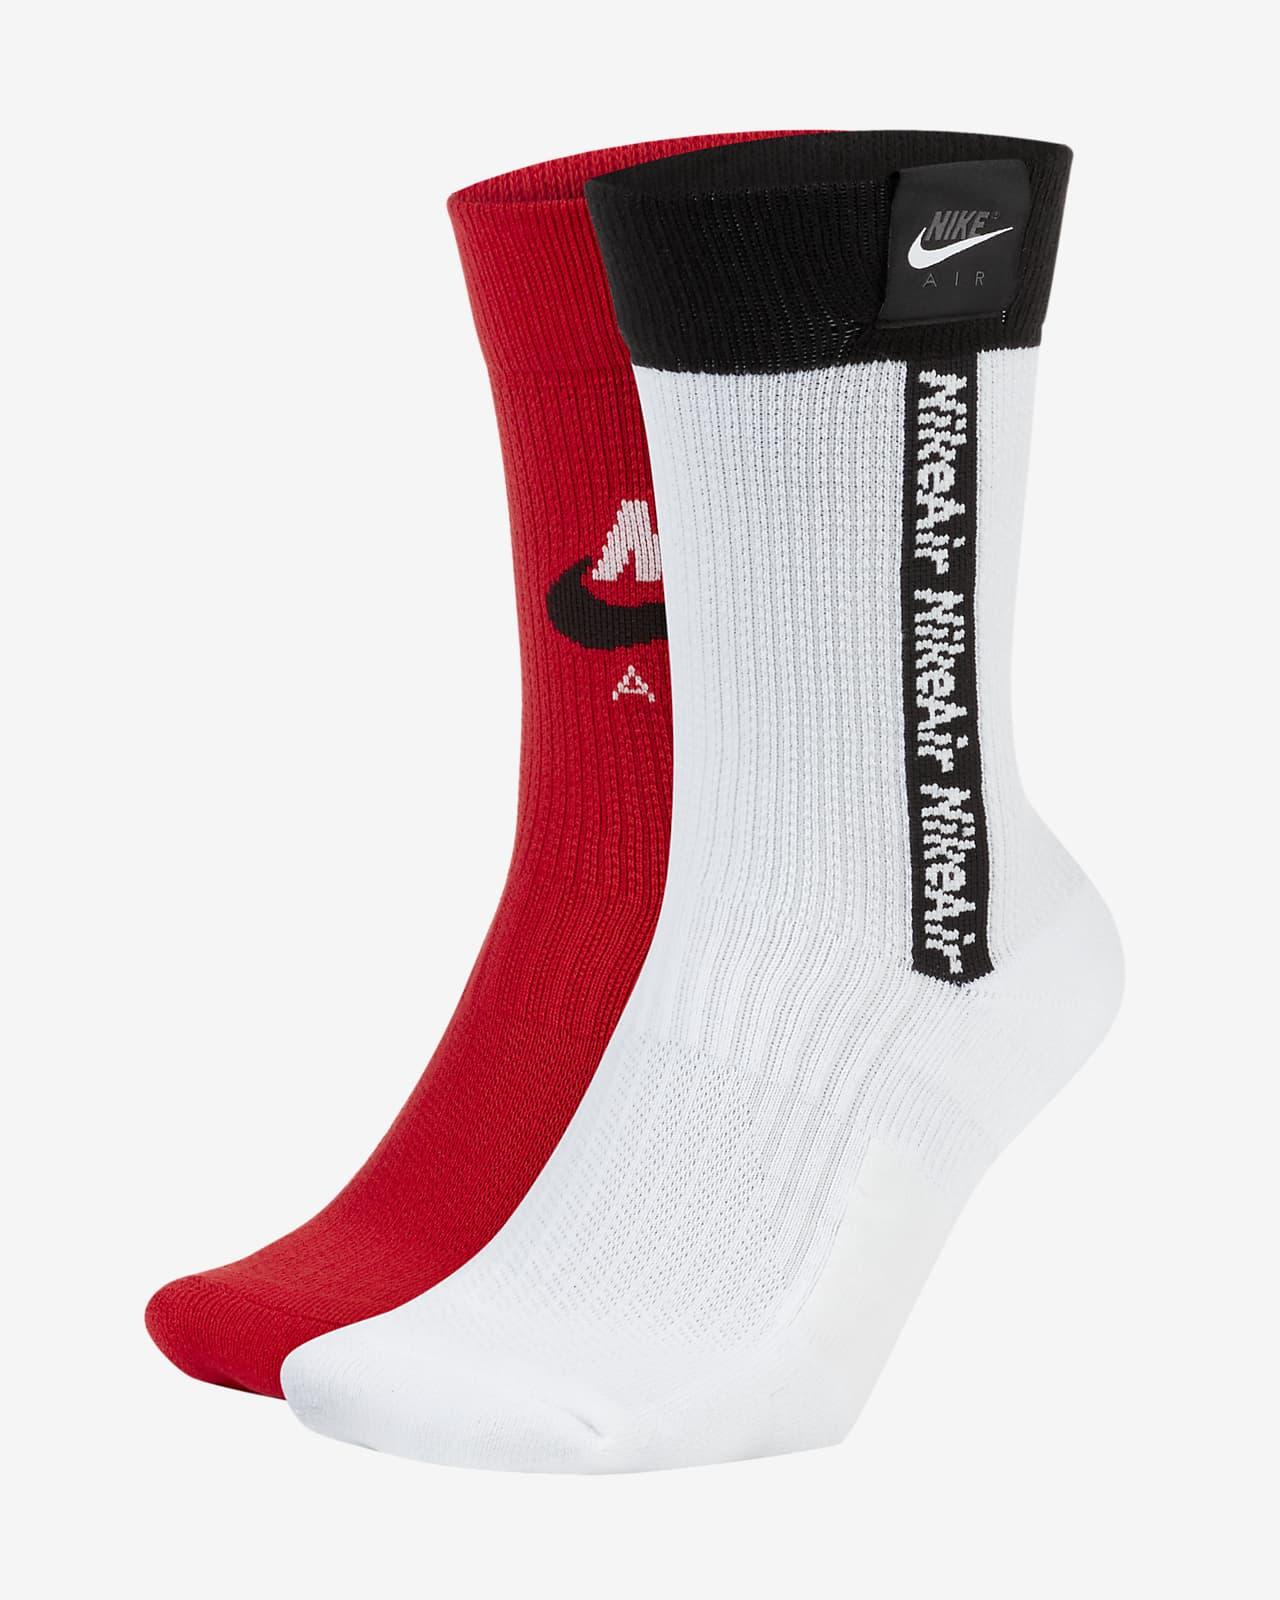 Meias Nike Air SNKR SOX (2 pares)